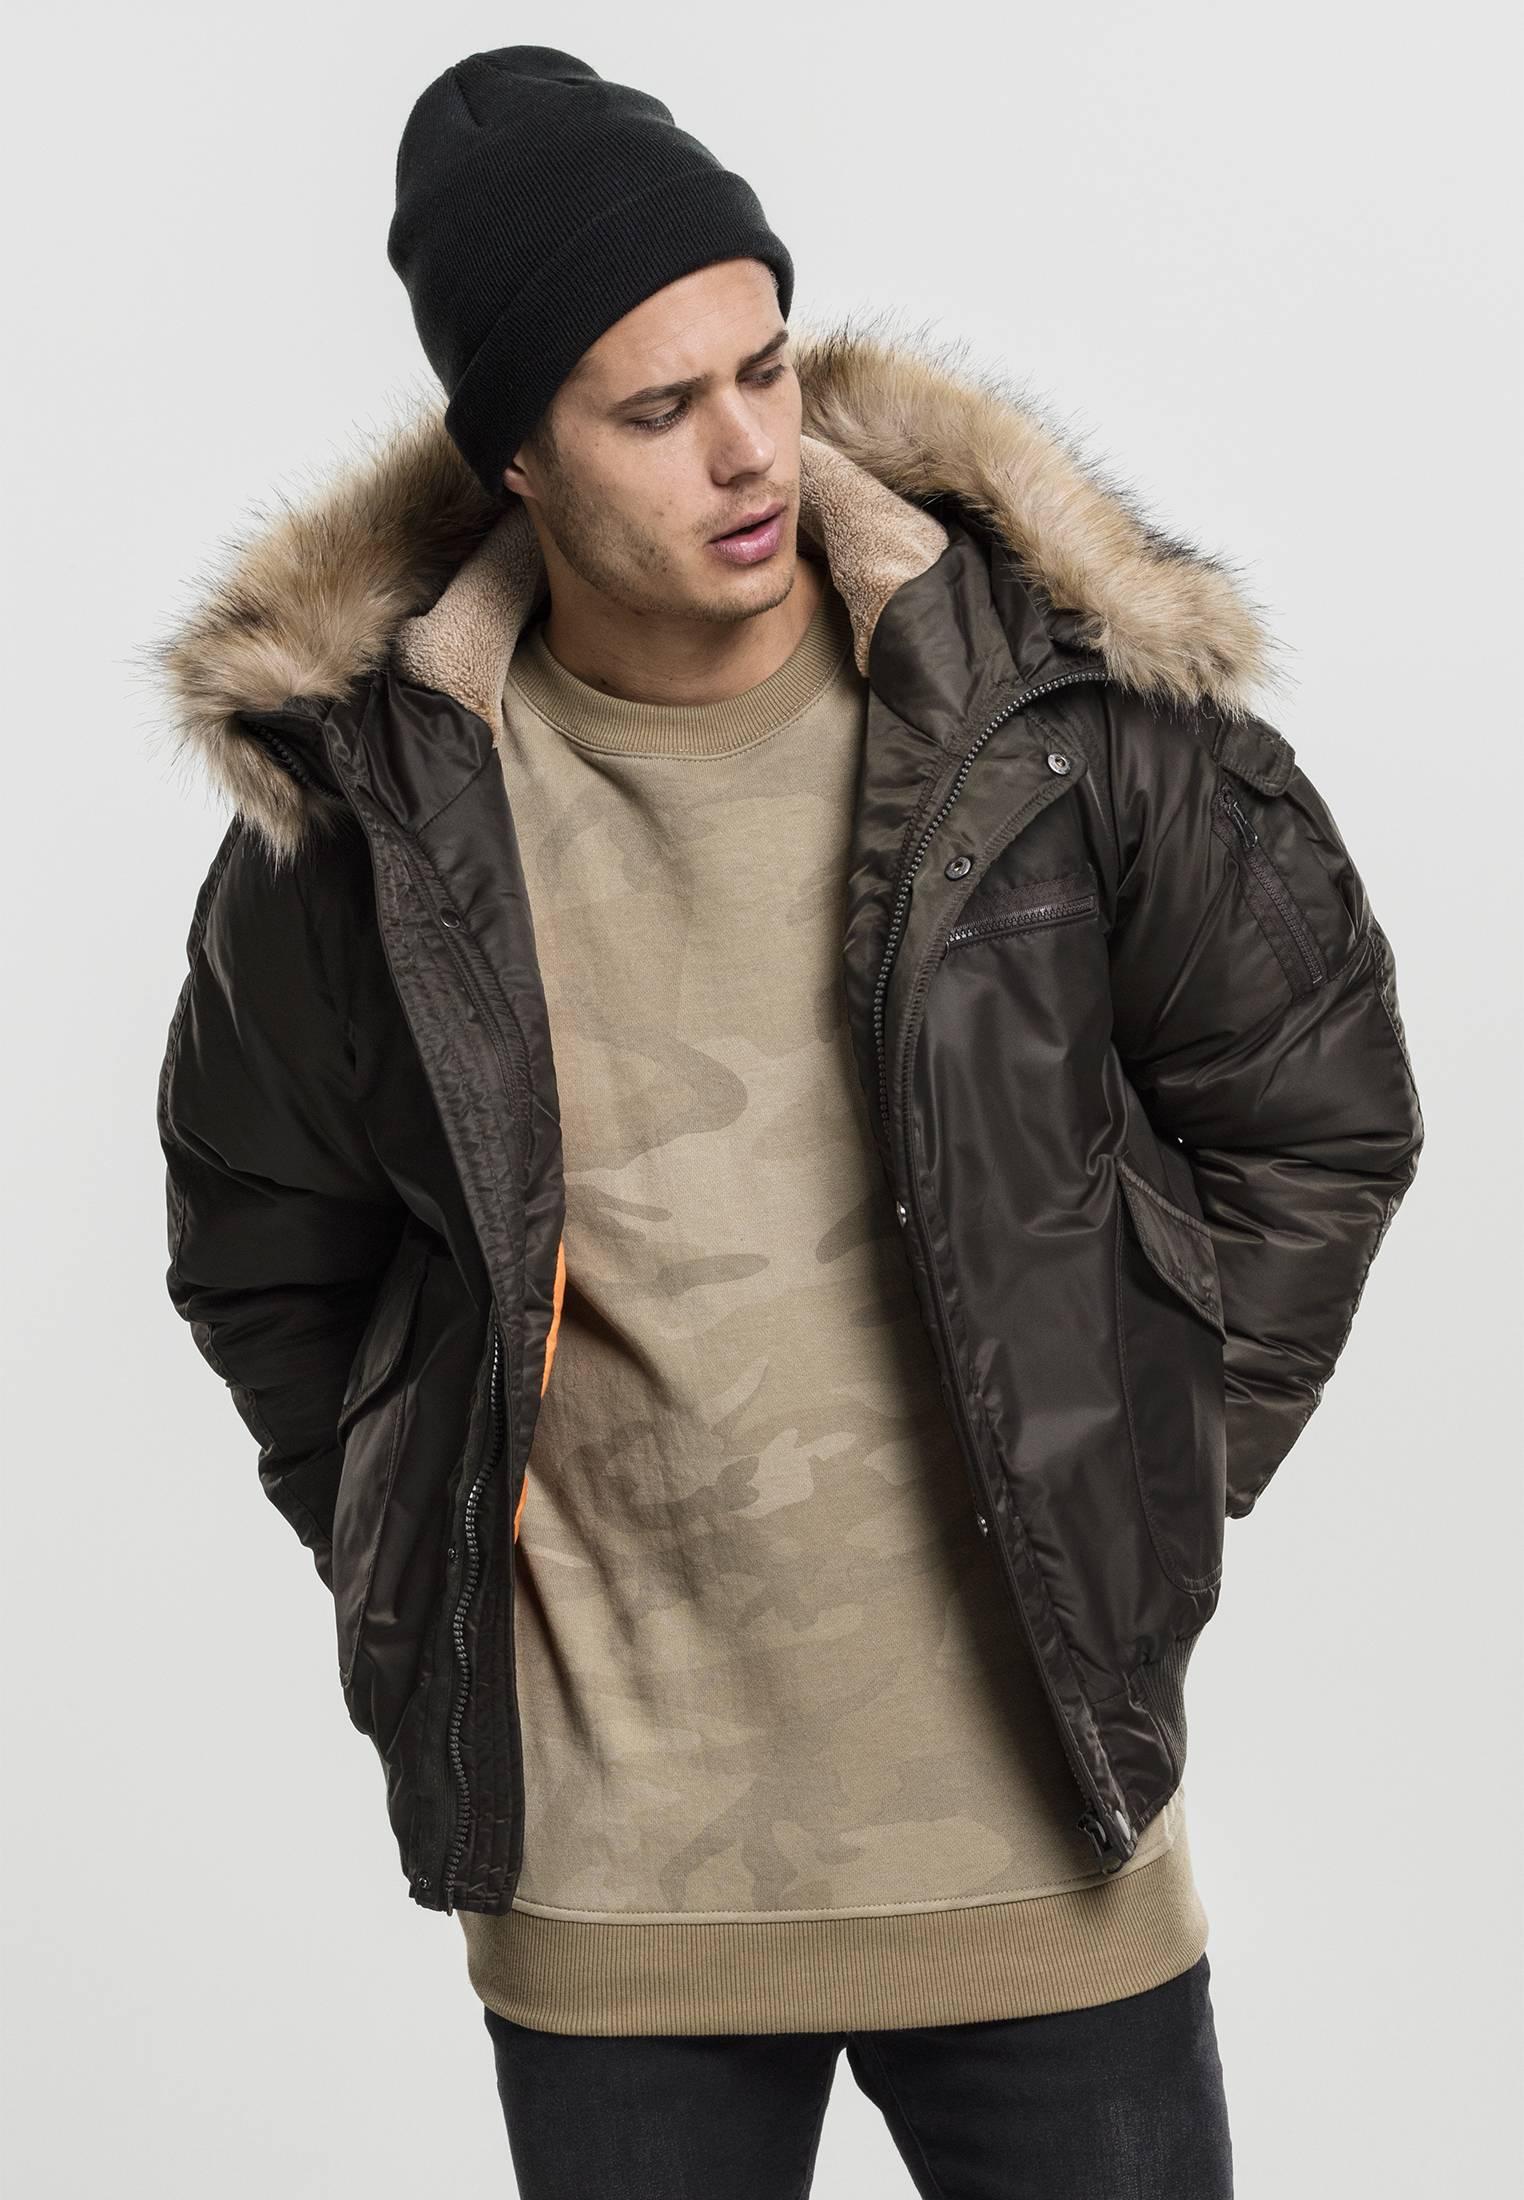 Urban Classics Hooded Heavy Fake Fur Bomber Jacket dark olive - S